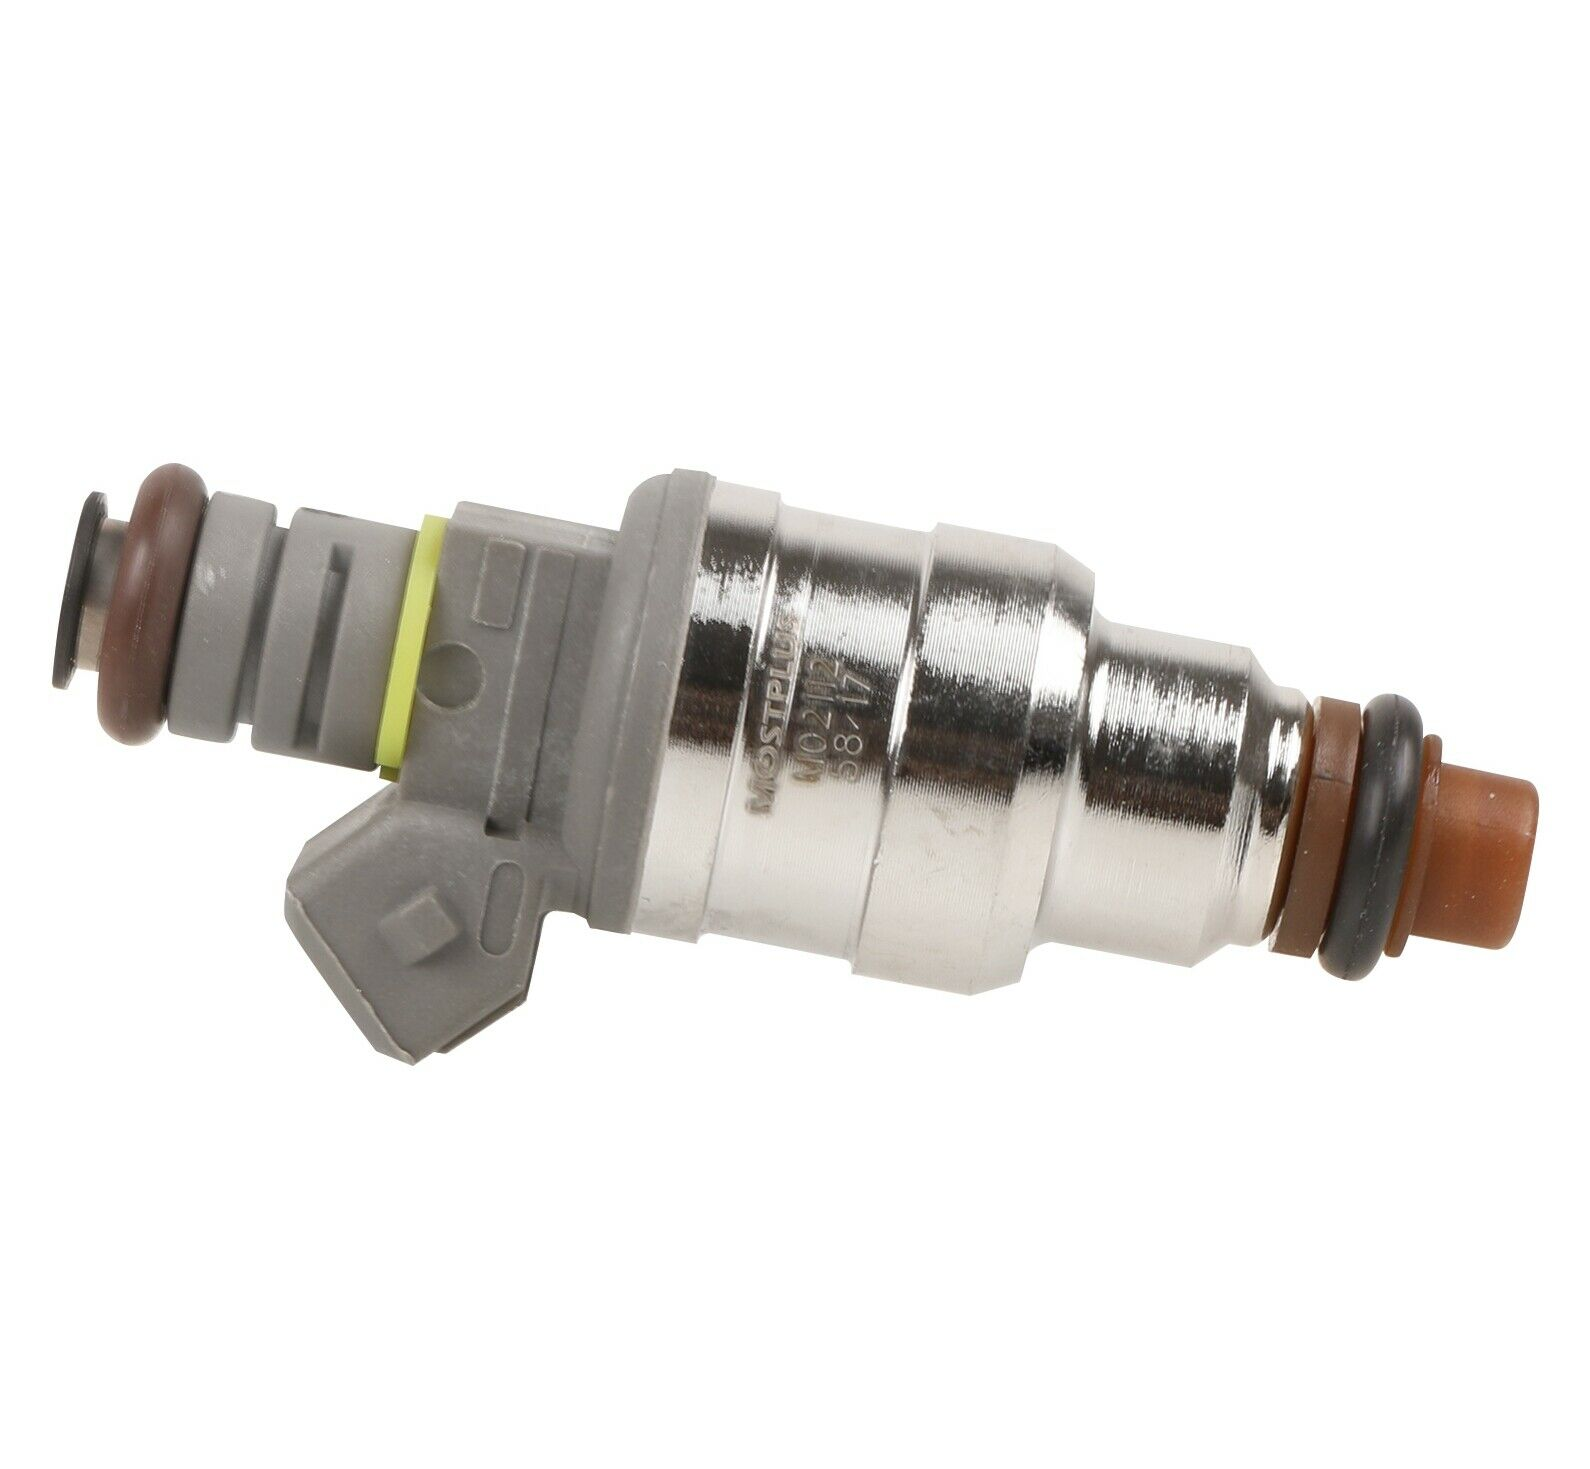 6 Flow Matched Fuel Injectors For Ford 6 Cyl 3.8L 4.9L F1ZE-B4C F1ZZ9F593B Set